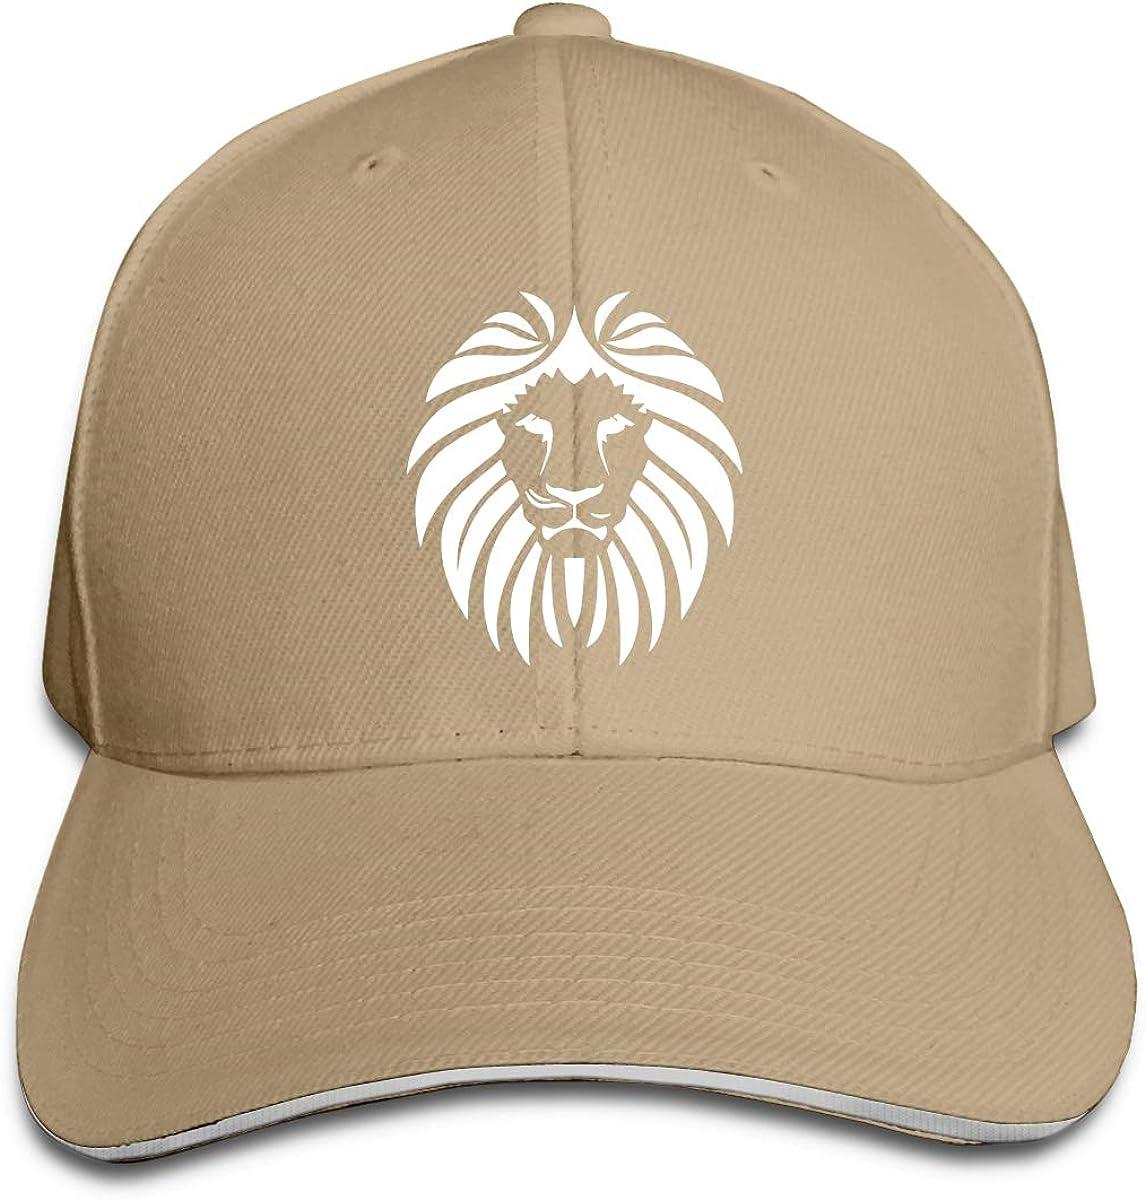 Lions Reggae Men and Women Adjustable Sandwich Peaked Baseball Cap